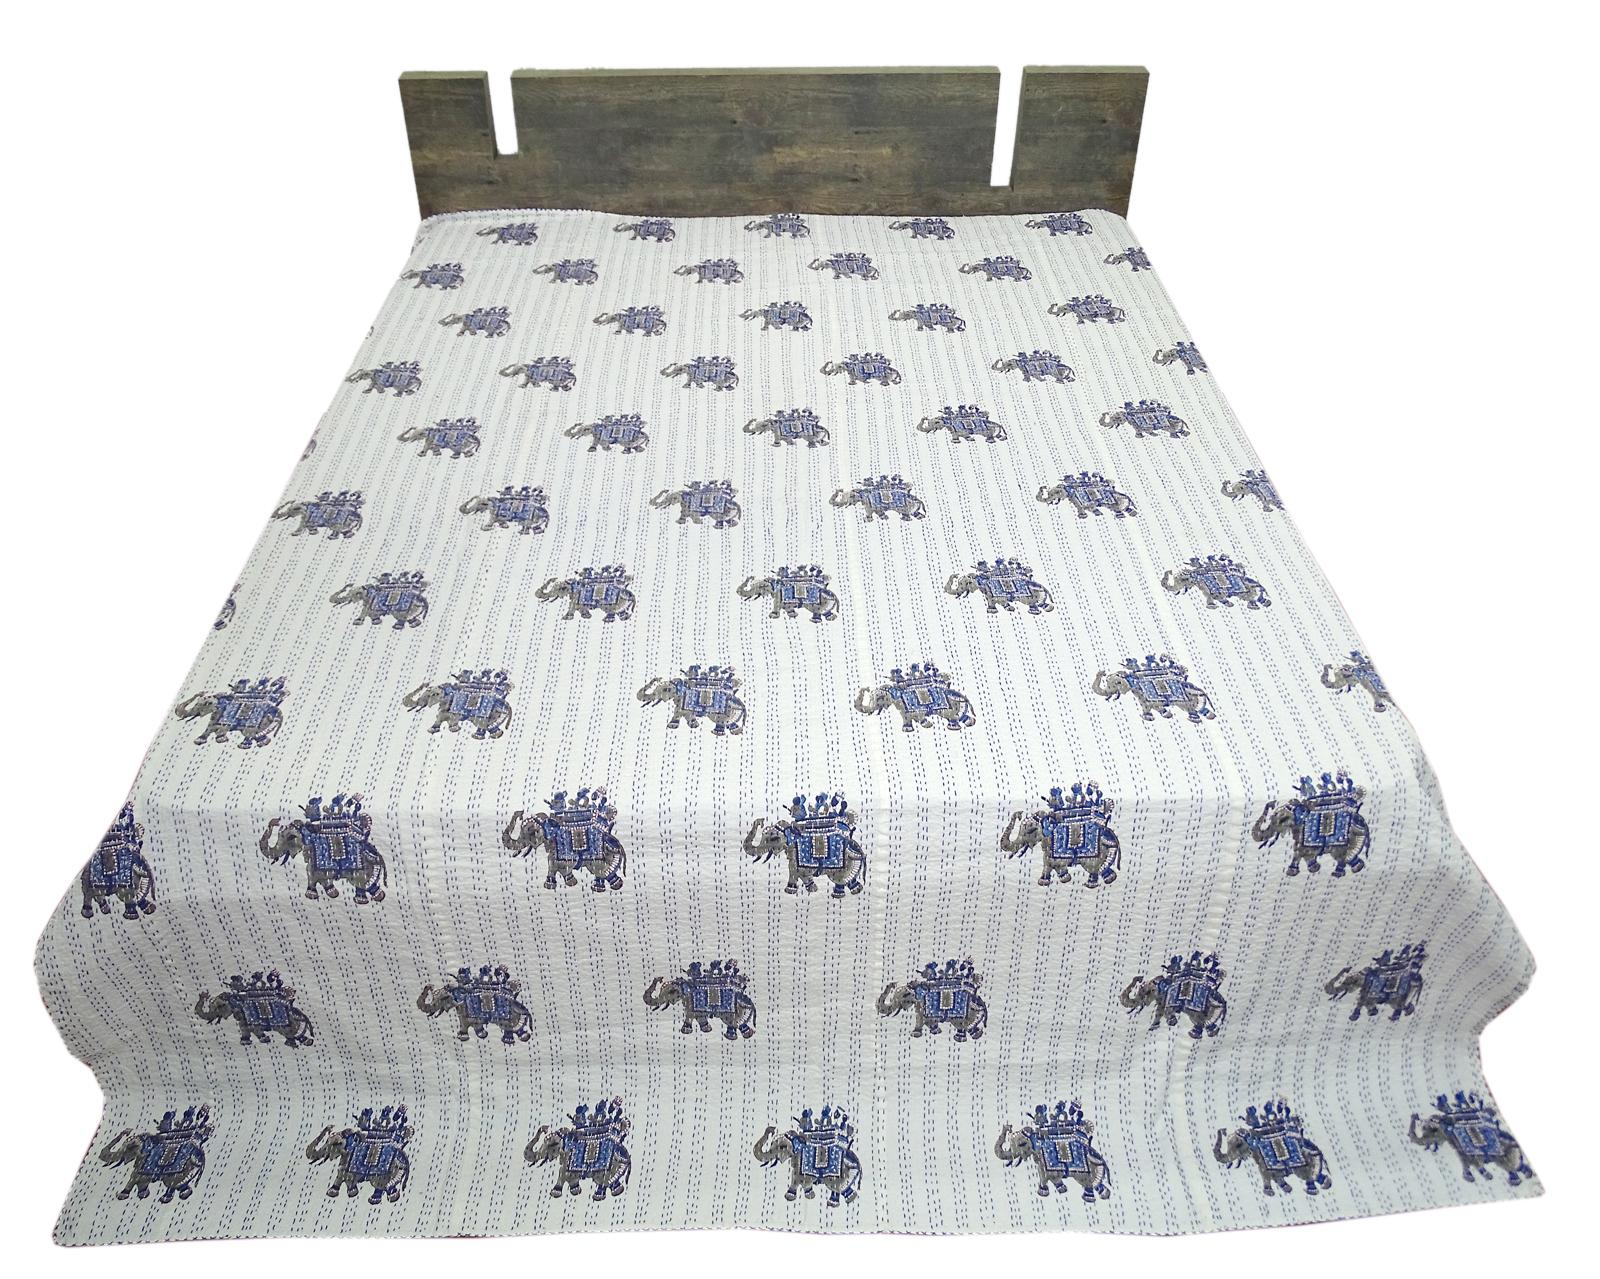 Handblock Printed Kantha Quilt